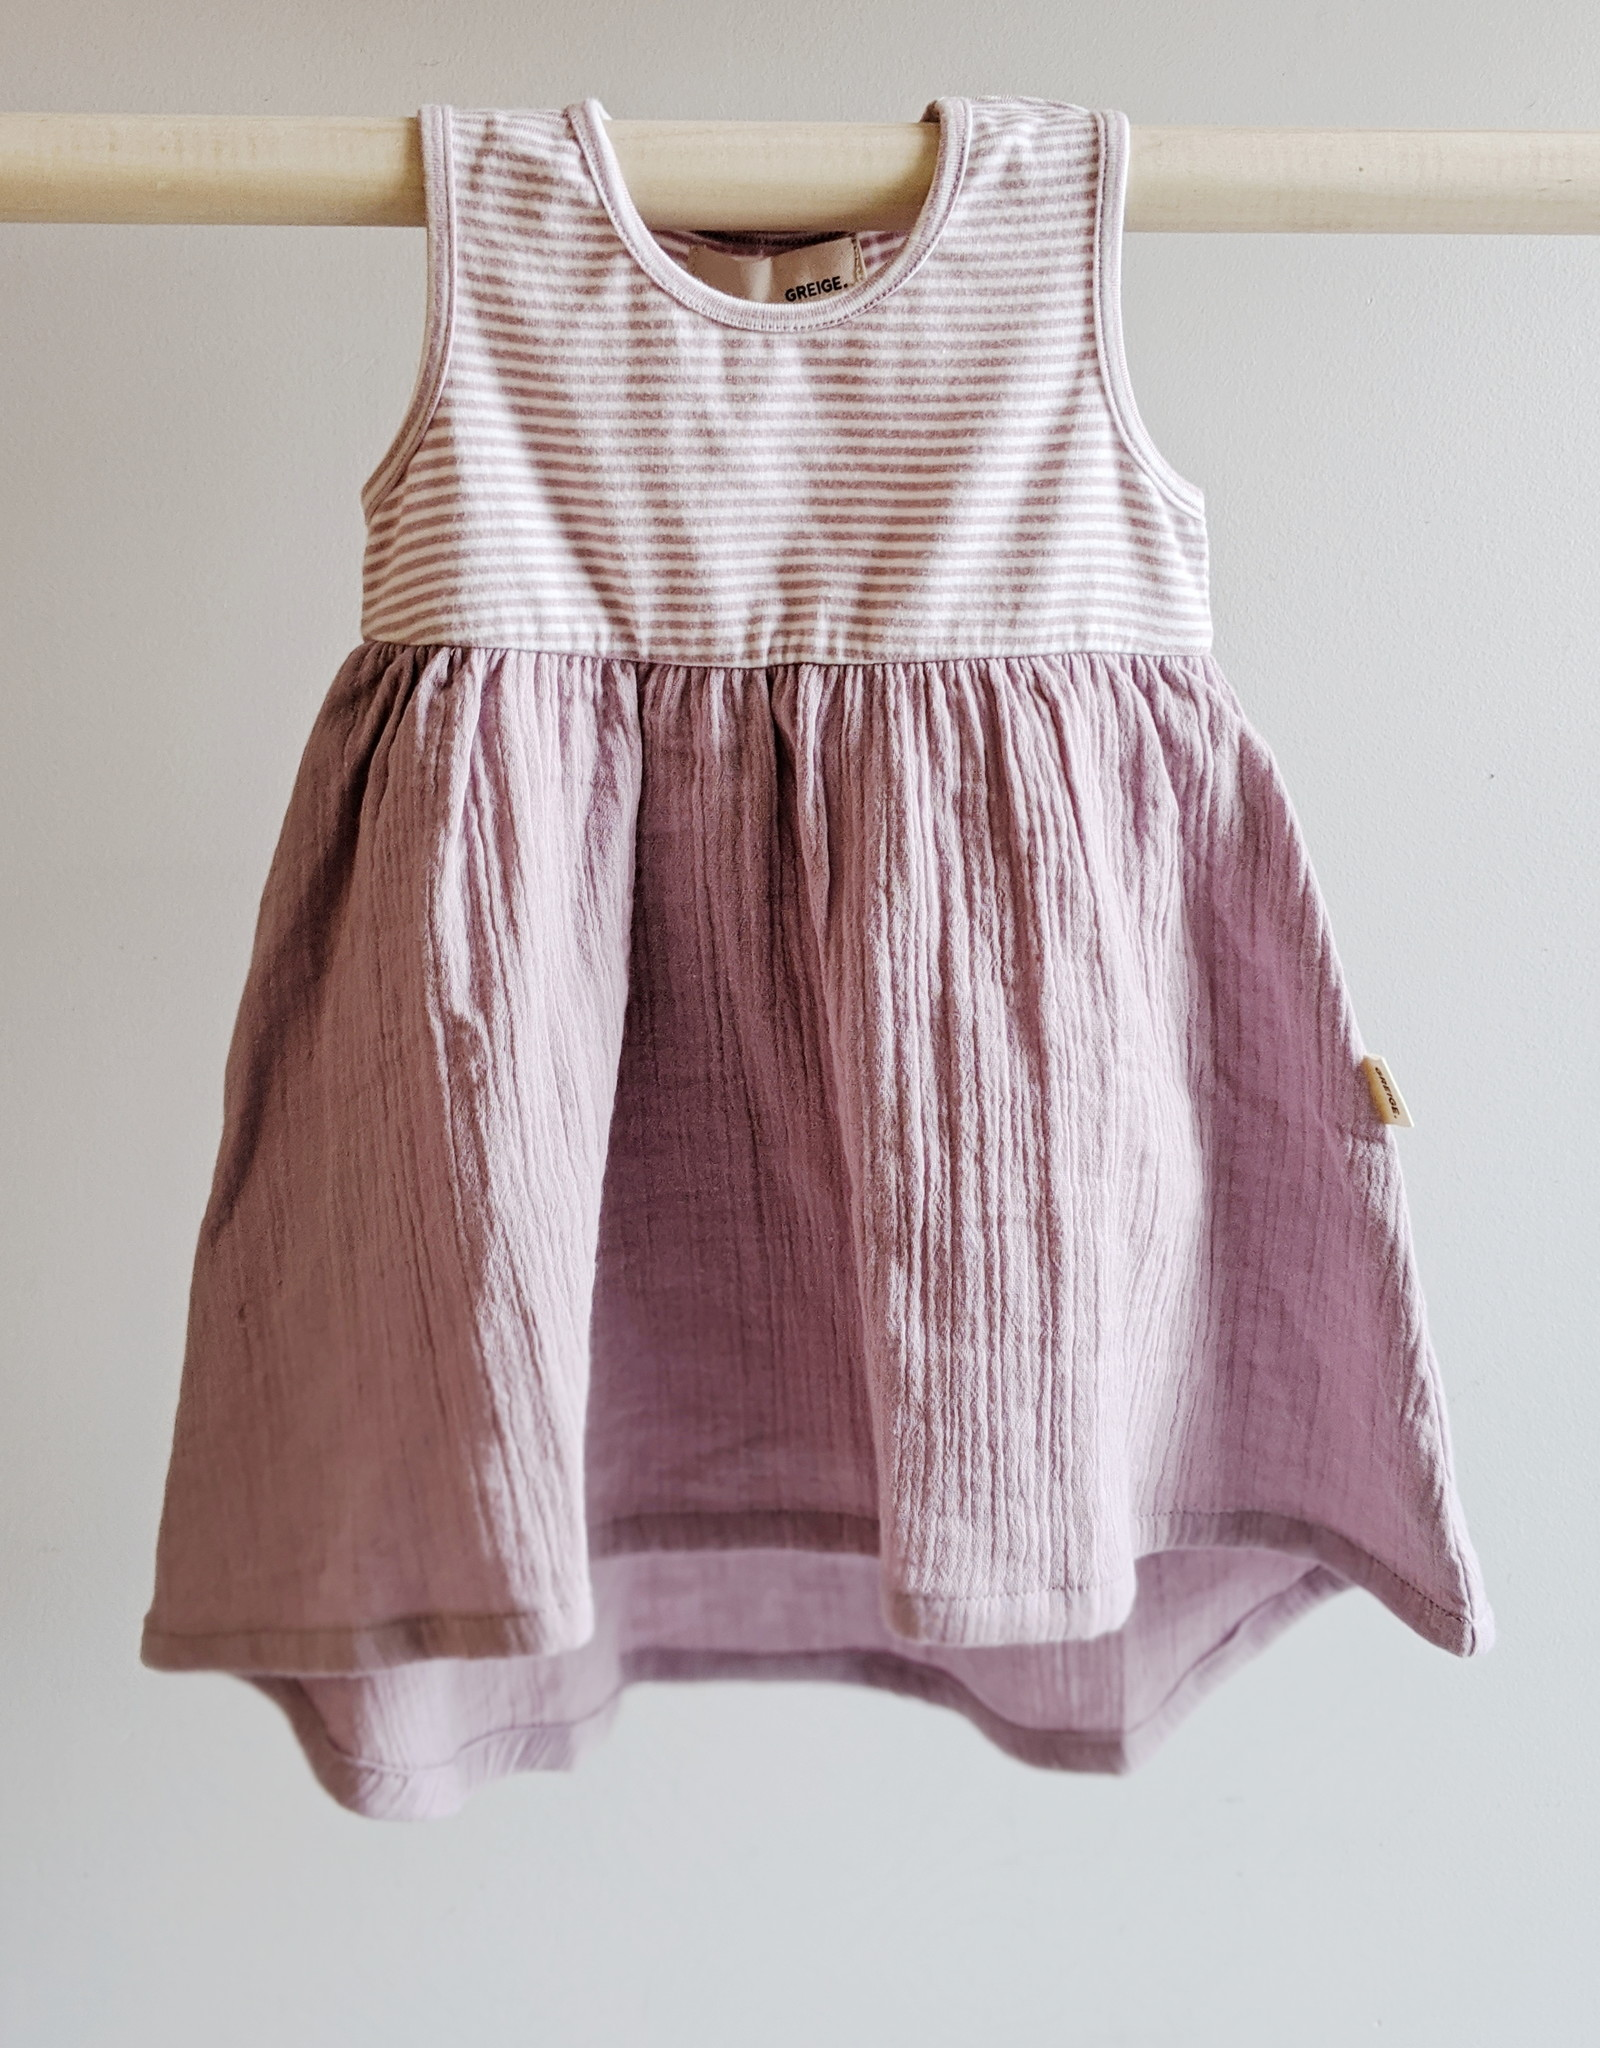 Greige Mixed Dress